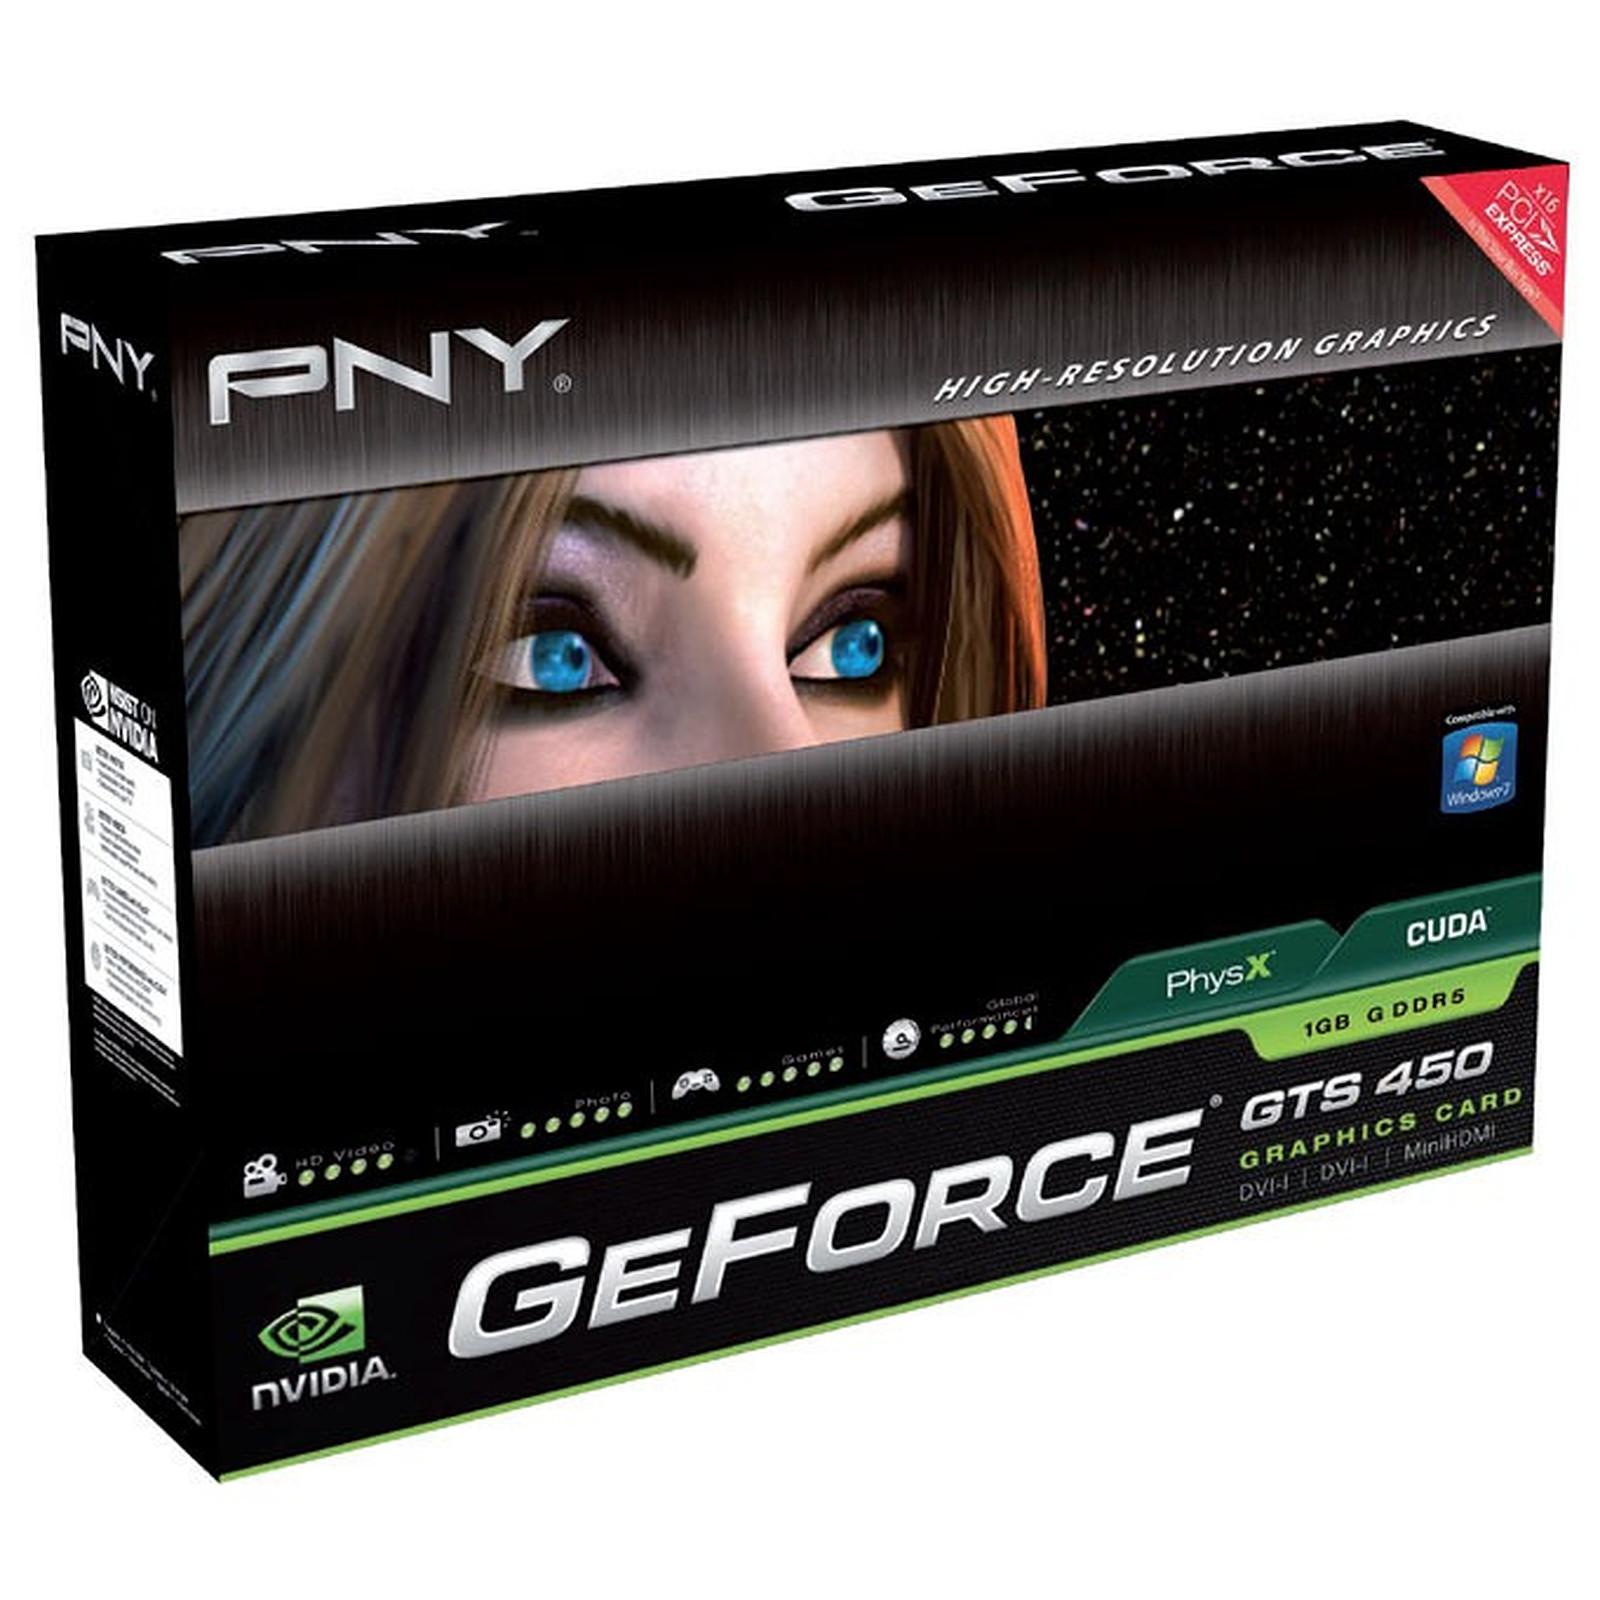 PNY GeForce GTS 450 PCI-E 1Go